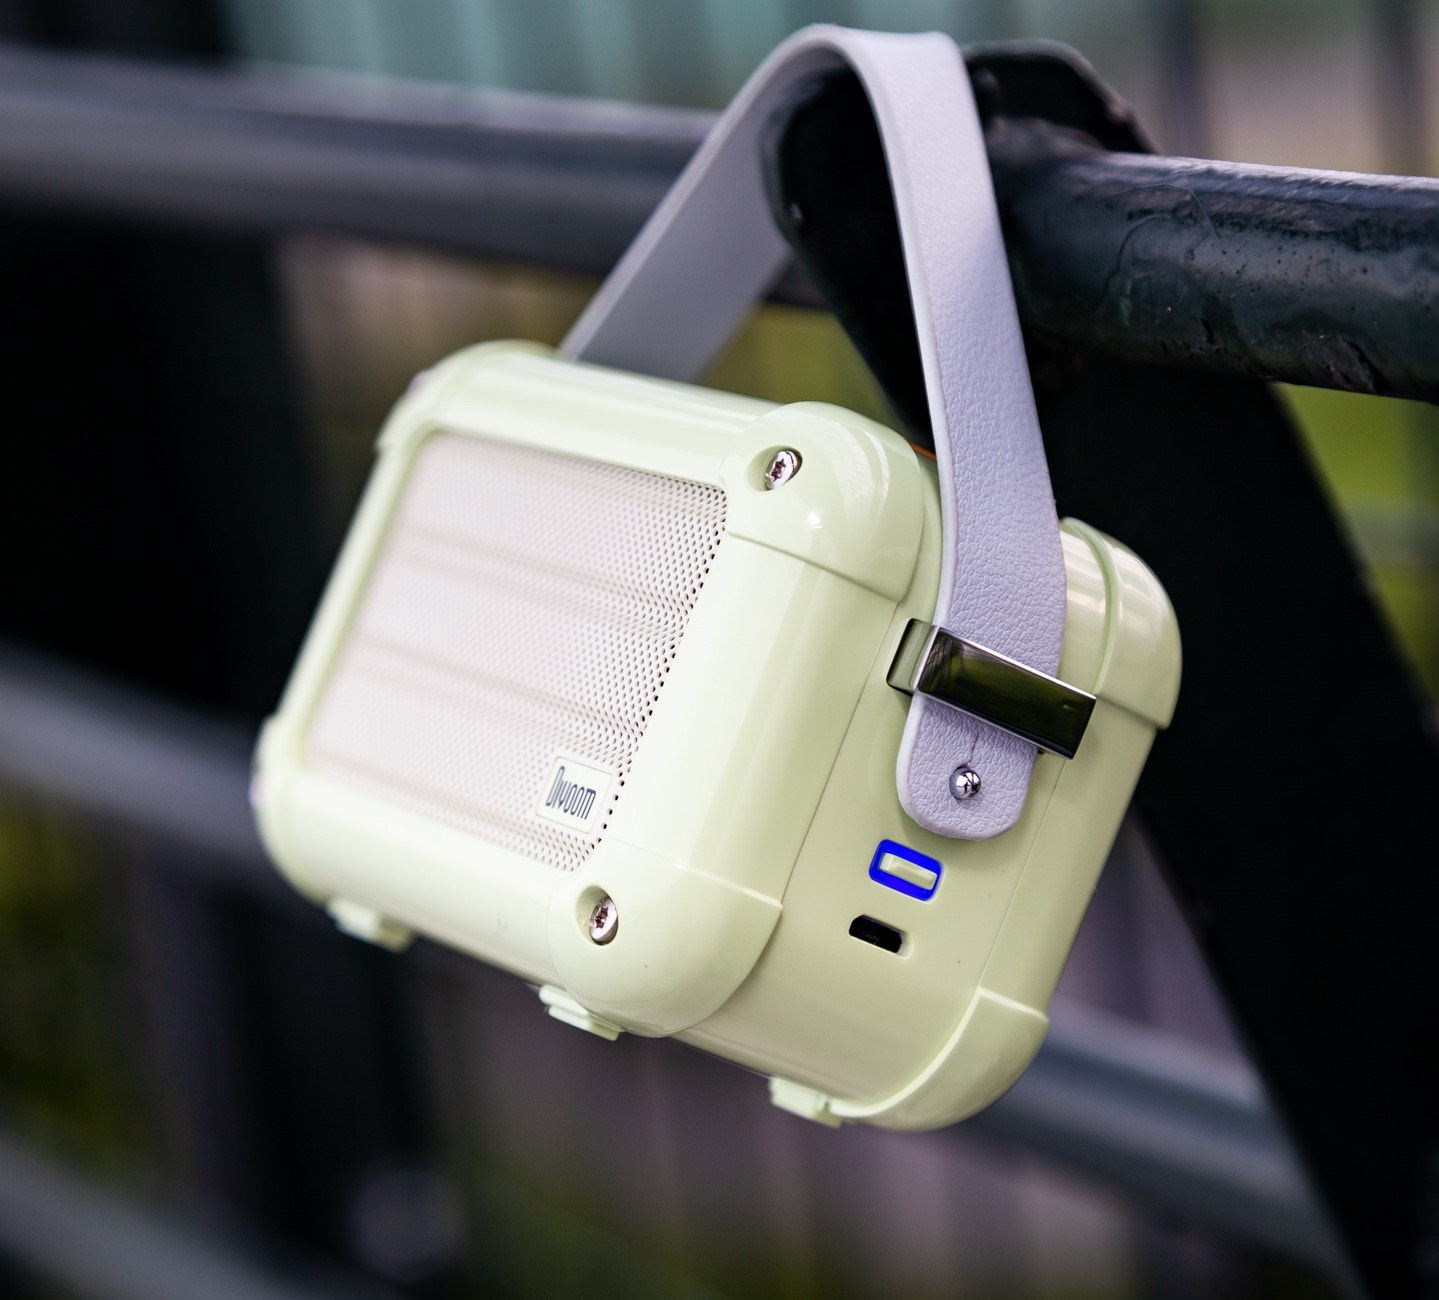 Loa-Bluetooth-Loa-Macchiato-Xanh-la-1